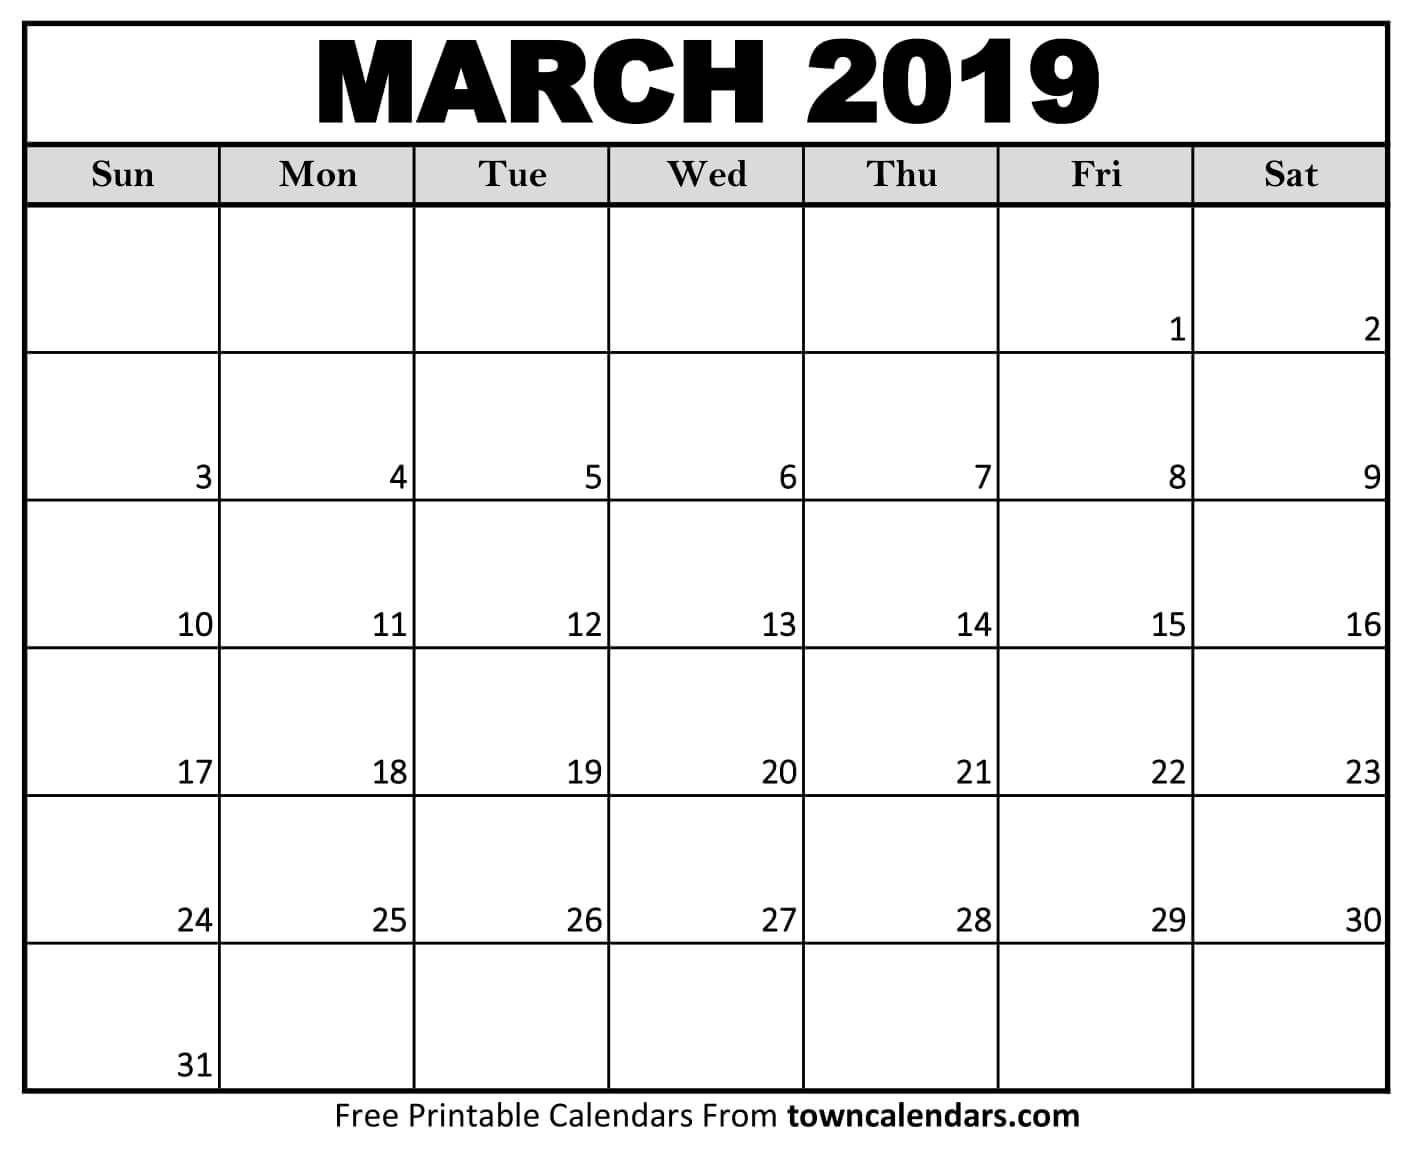 March 2019 Calendar Excel Templates   Monthly Calendar With Regard To March April Calendar Printable